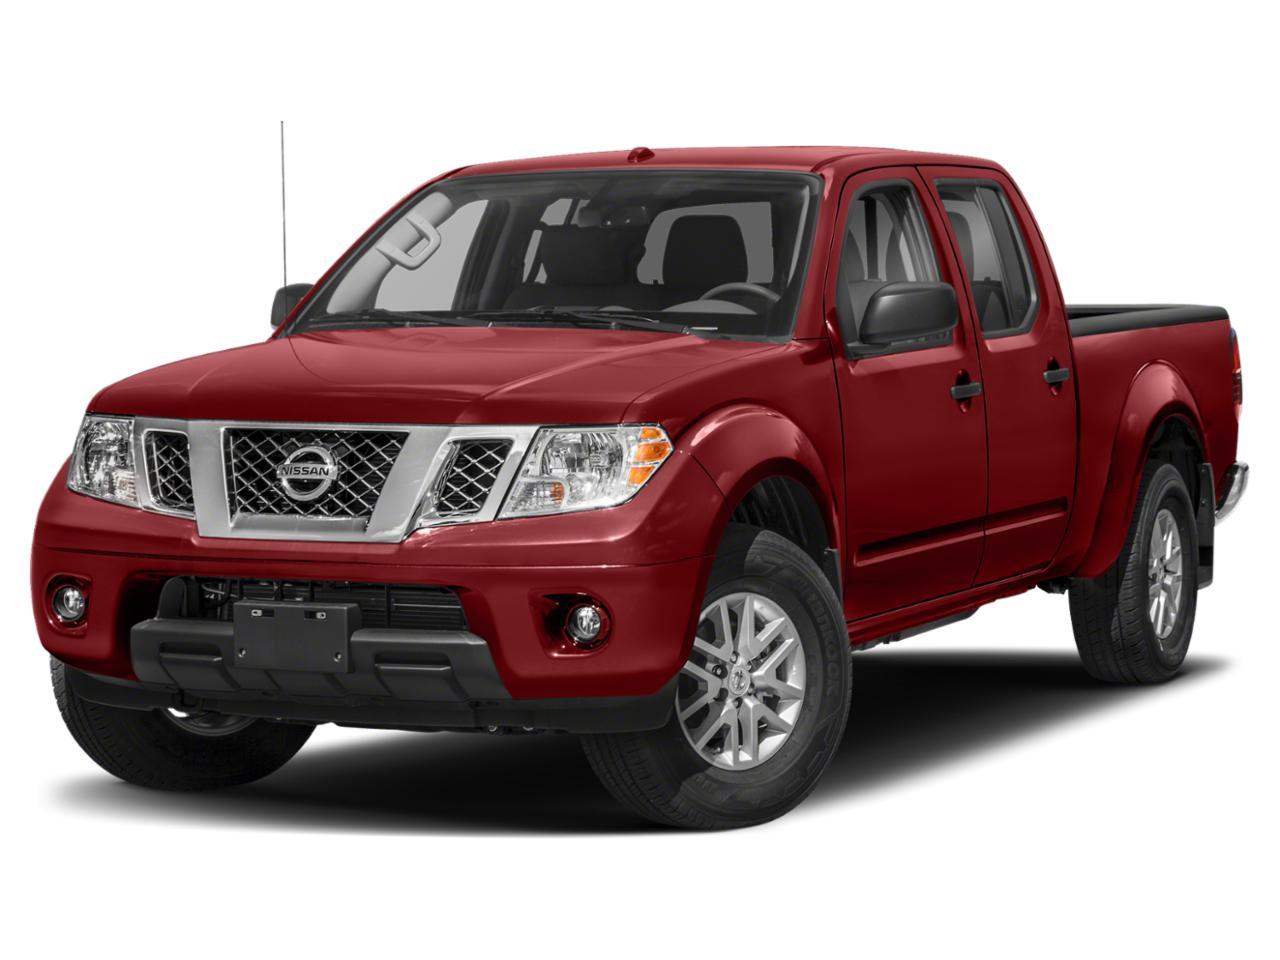 2019 Nissan Frontier CREW CAB 4X4 SV AUTO *LTD AVAIL* Crew Cab Pickup Slide